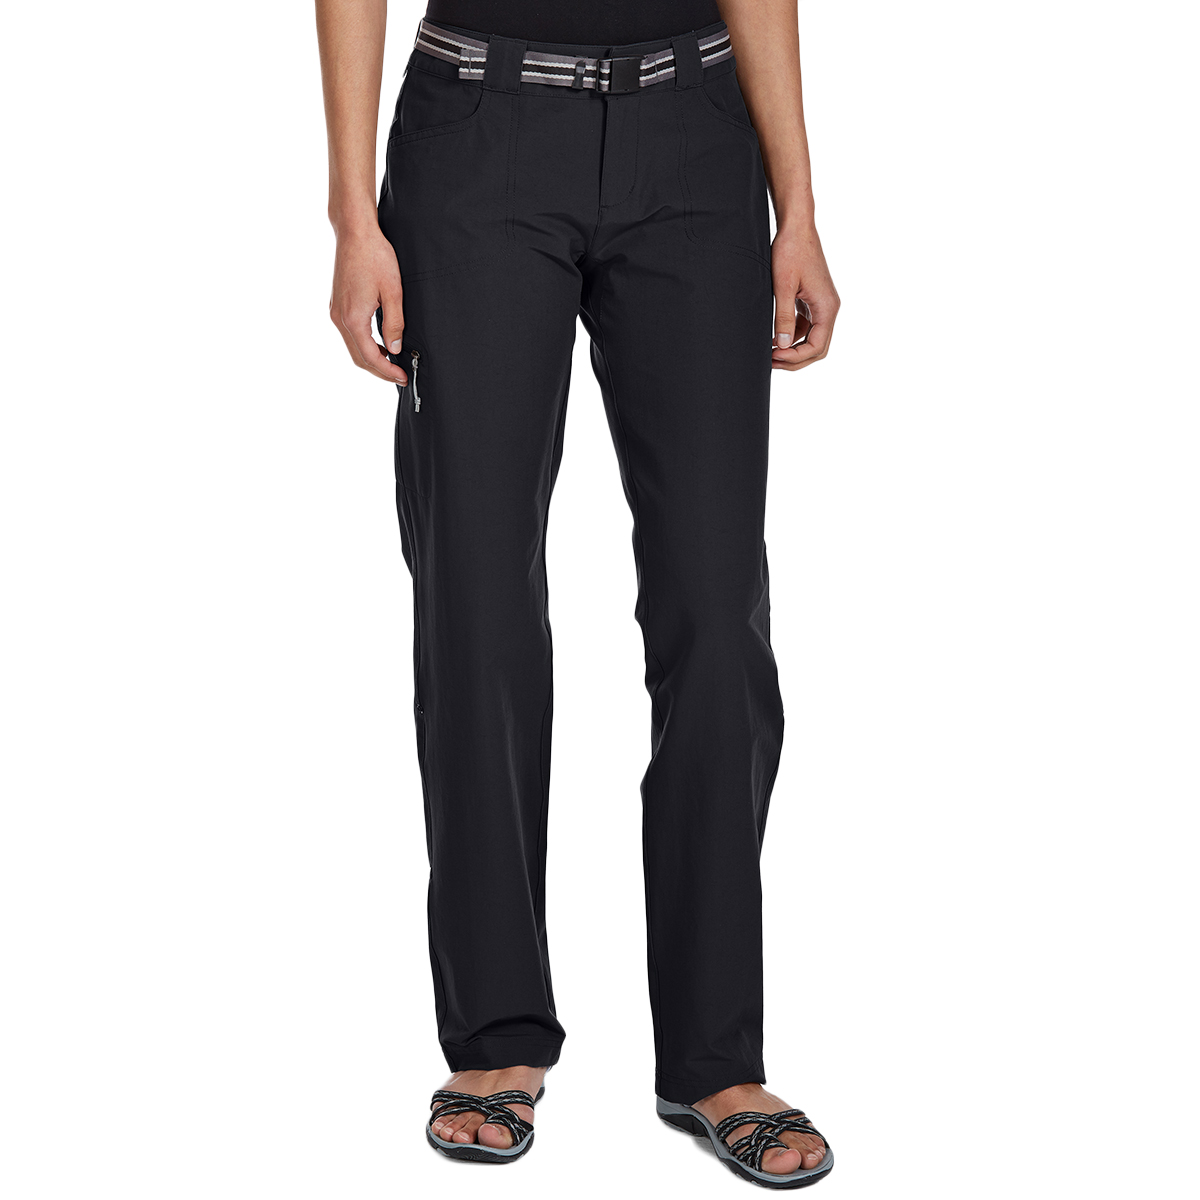 Ems Women's Compass Trek Pants - Black, 2/R